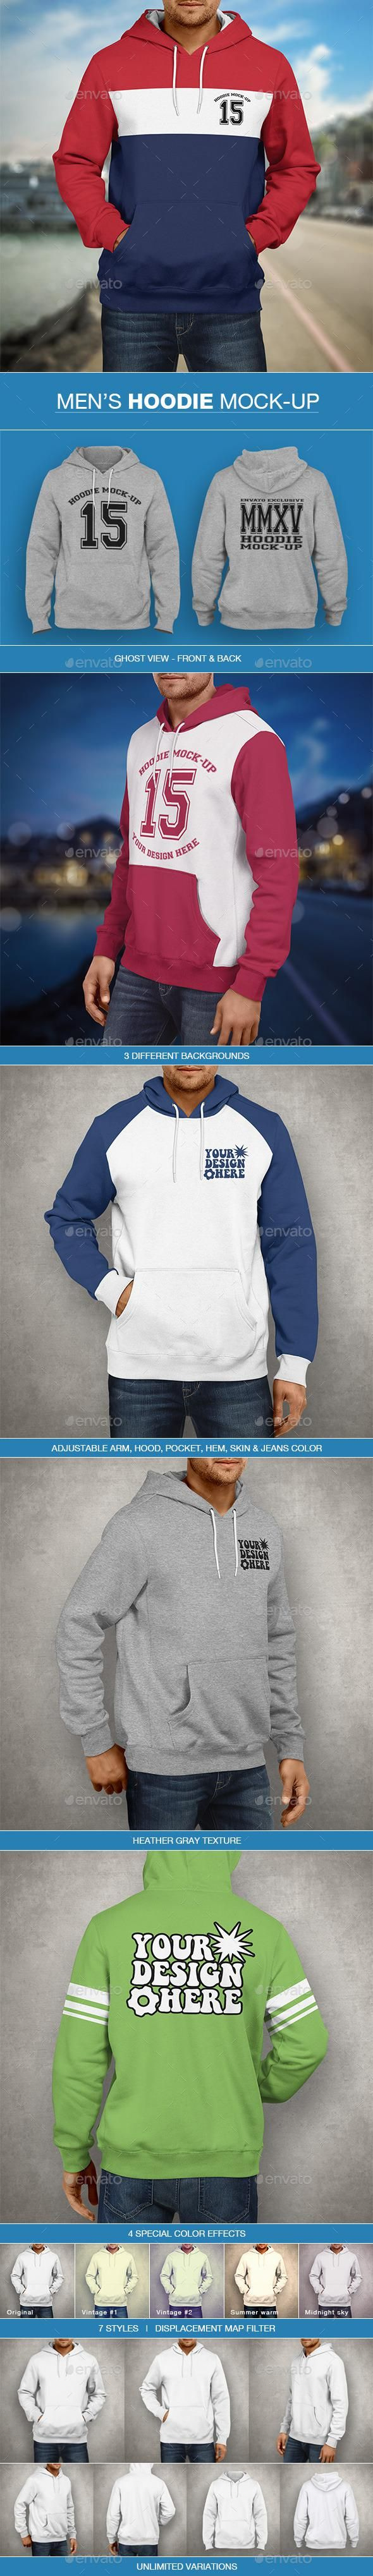 Download Hoodie Mockup Men S Edition Hoodie Mockup Clothing Mockup Shirt Logo Design